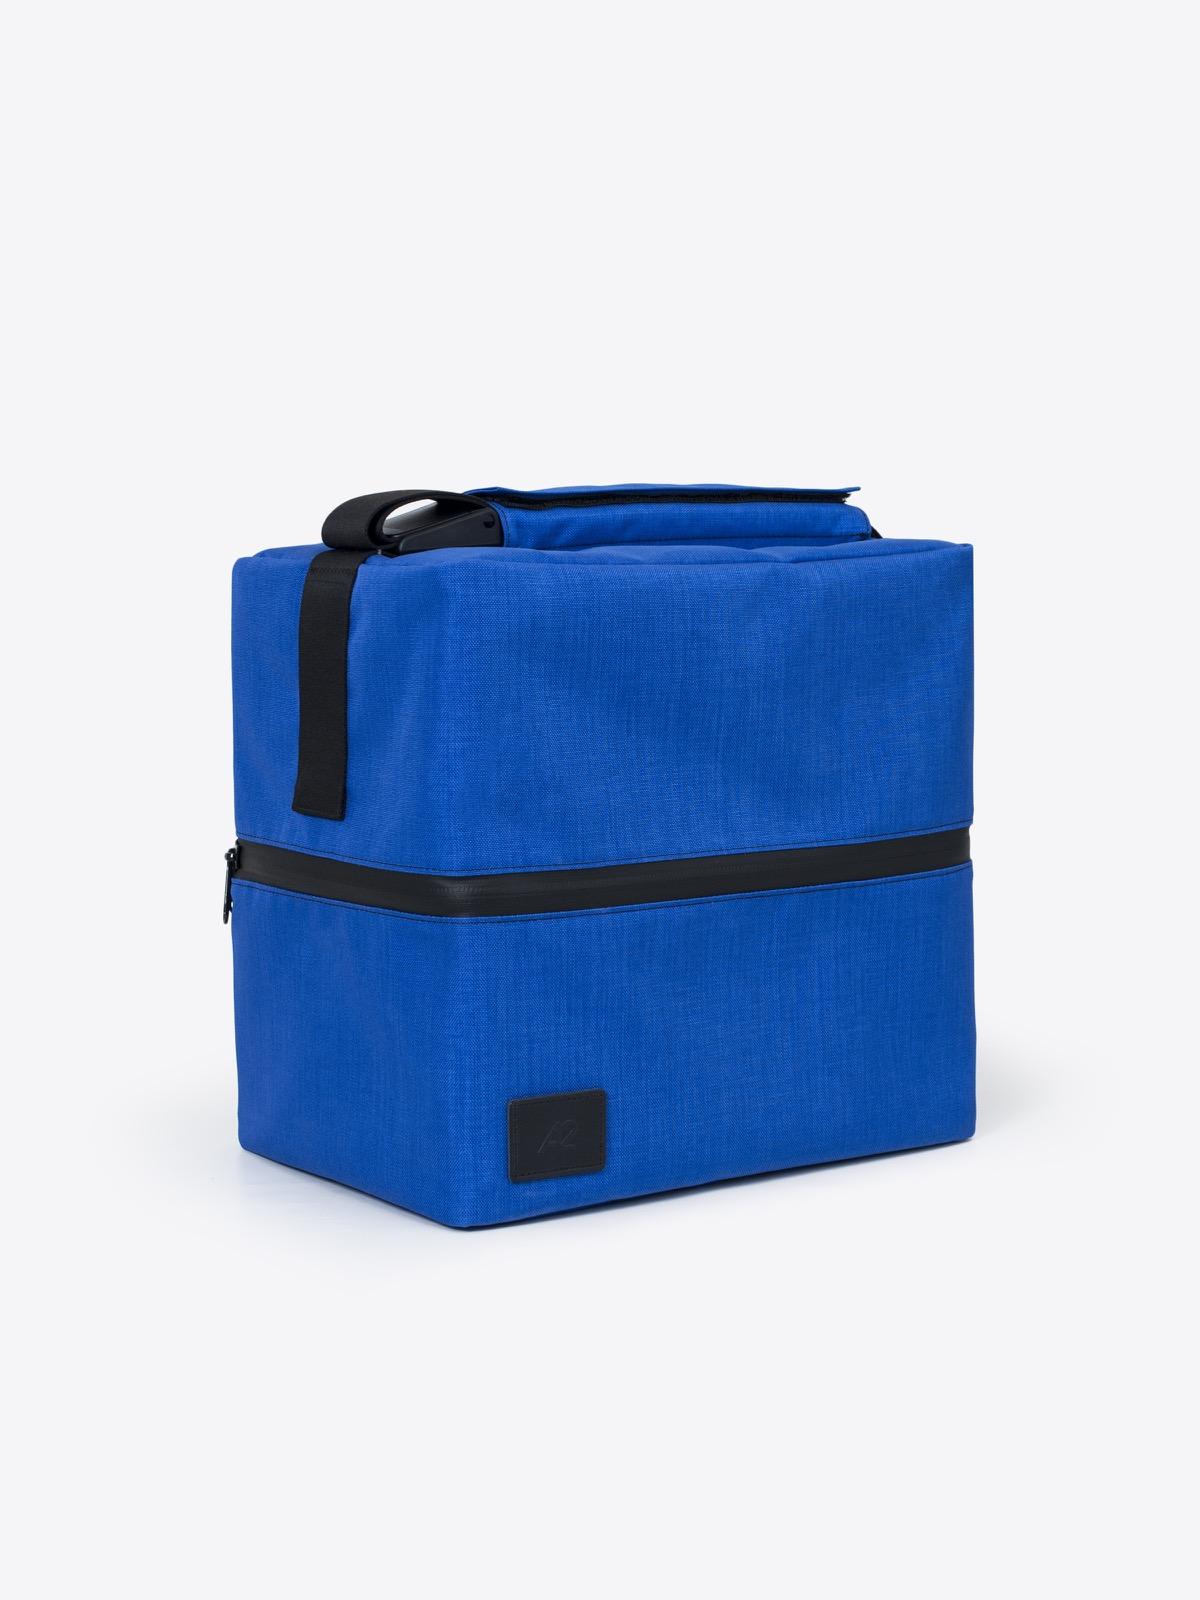 A2 nylon klein blue stealth edition